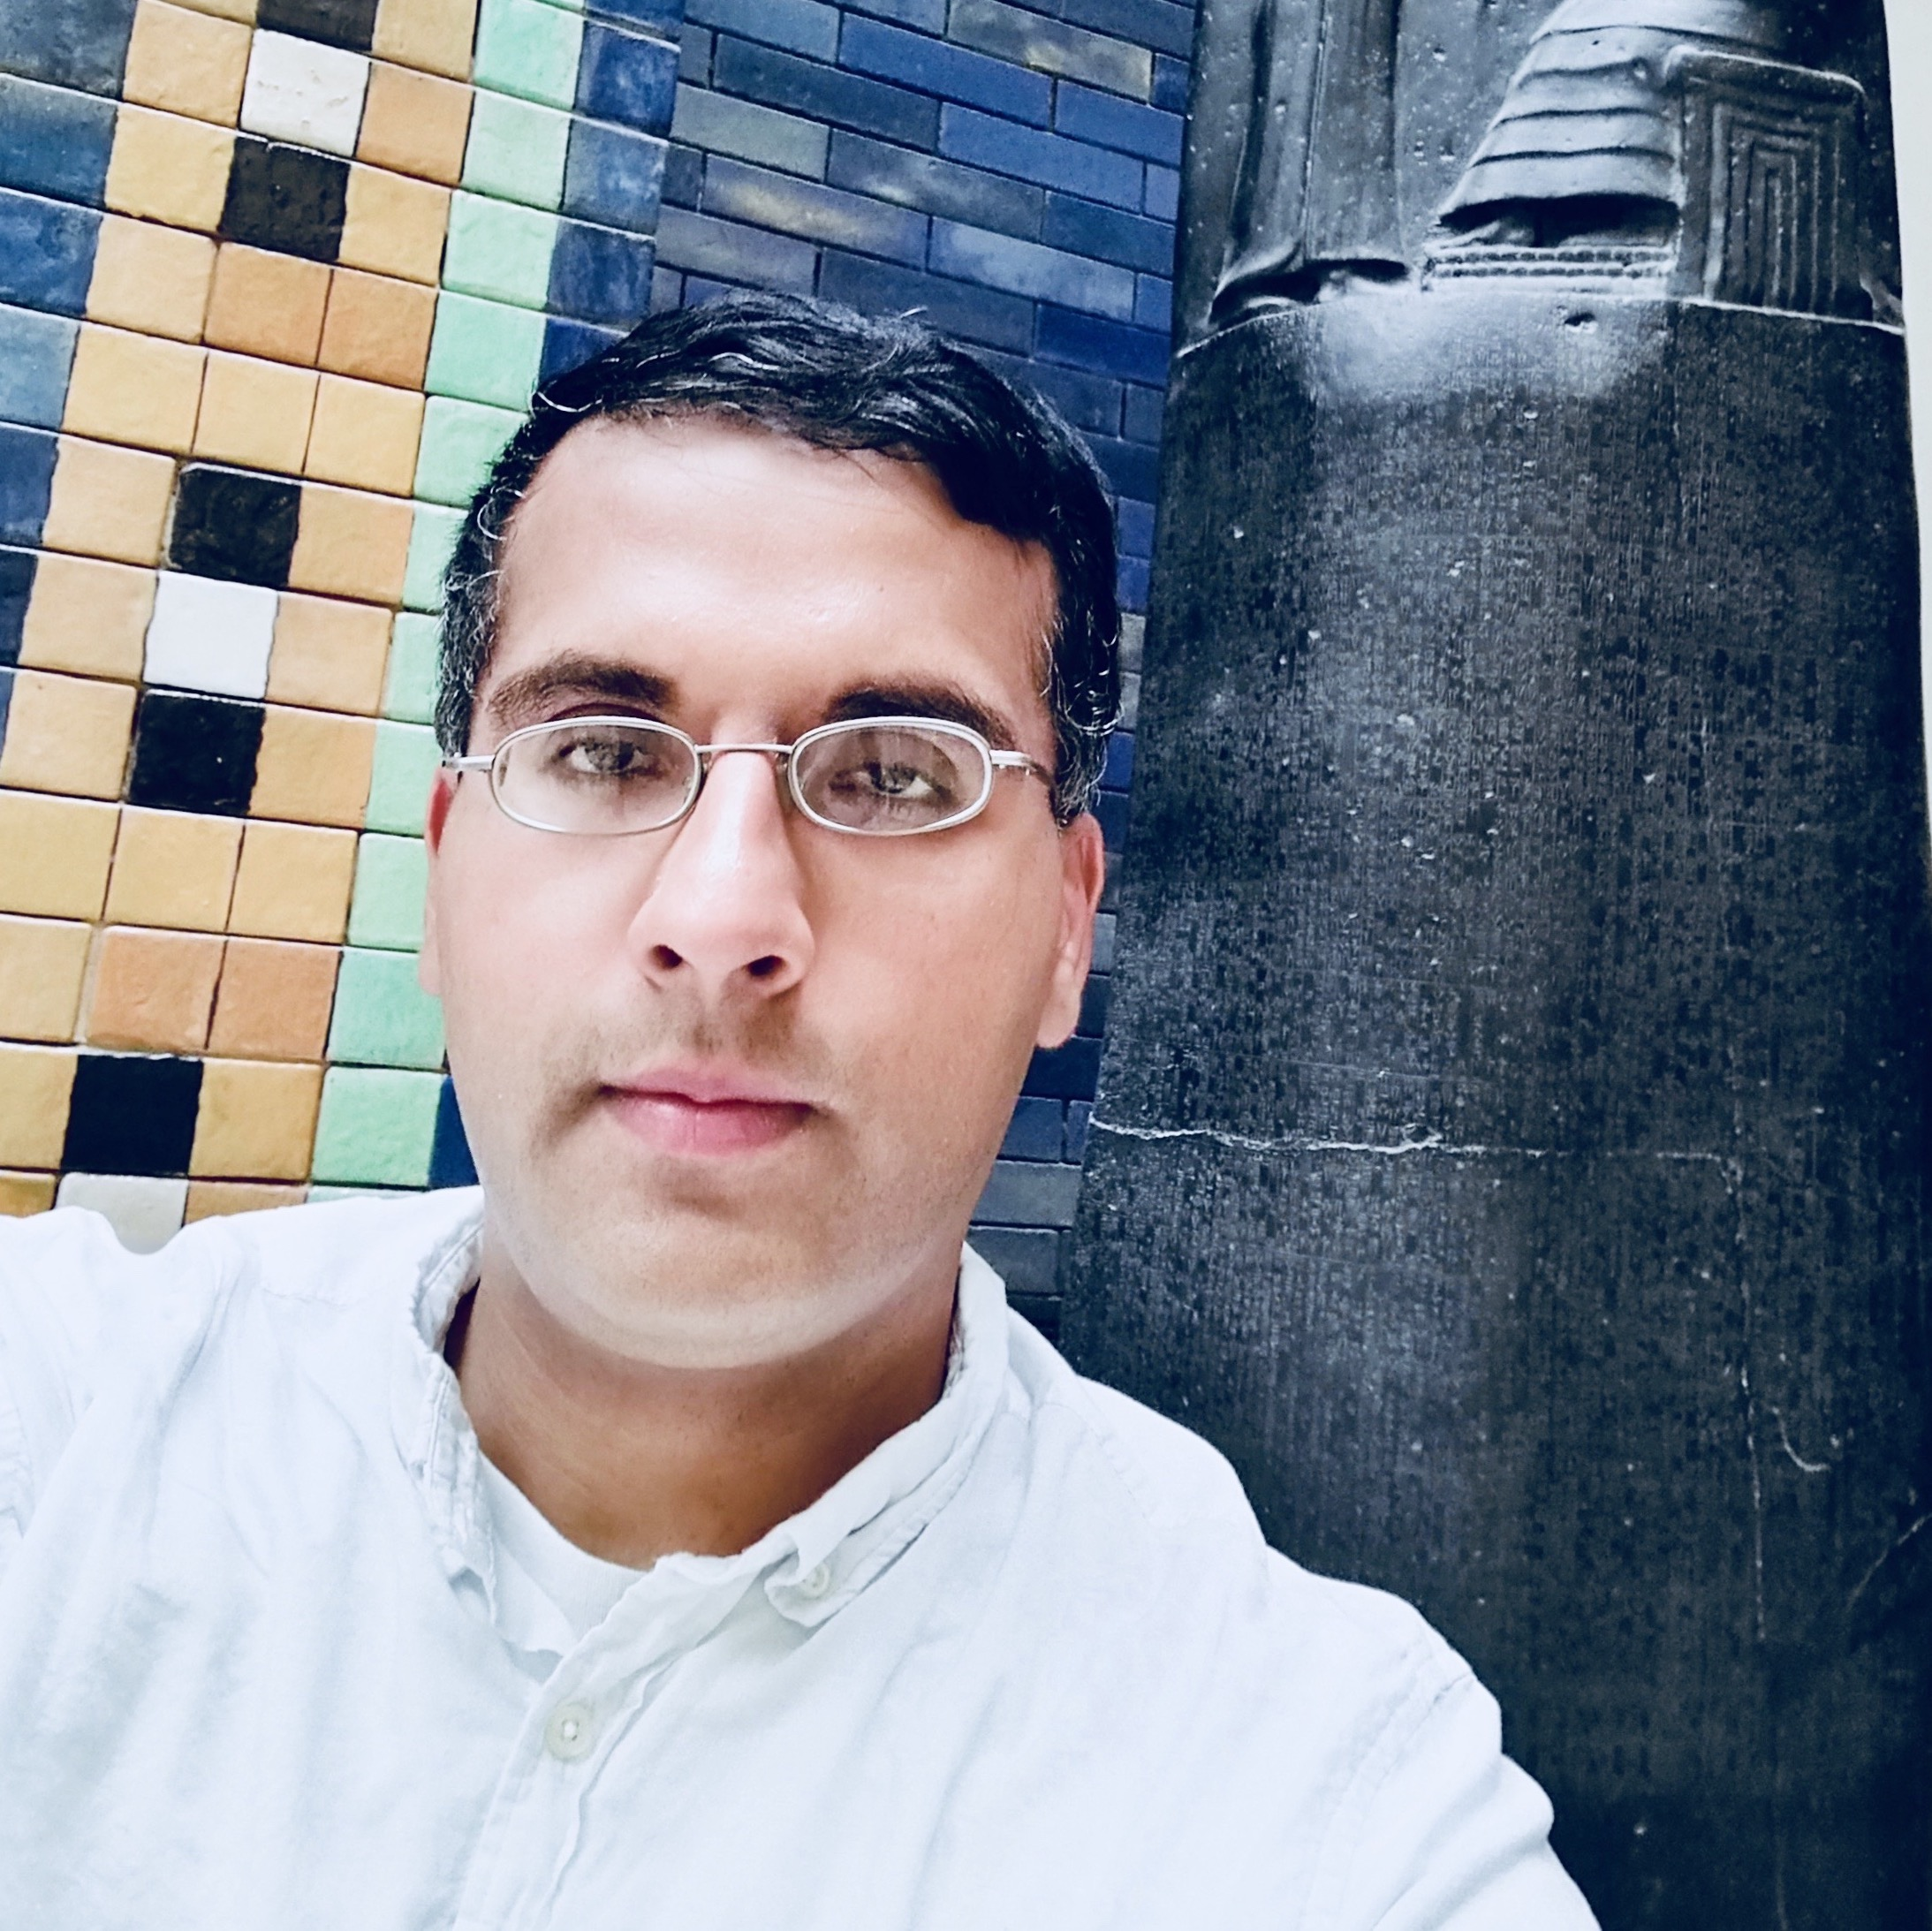 Faisal Chaudhry